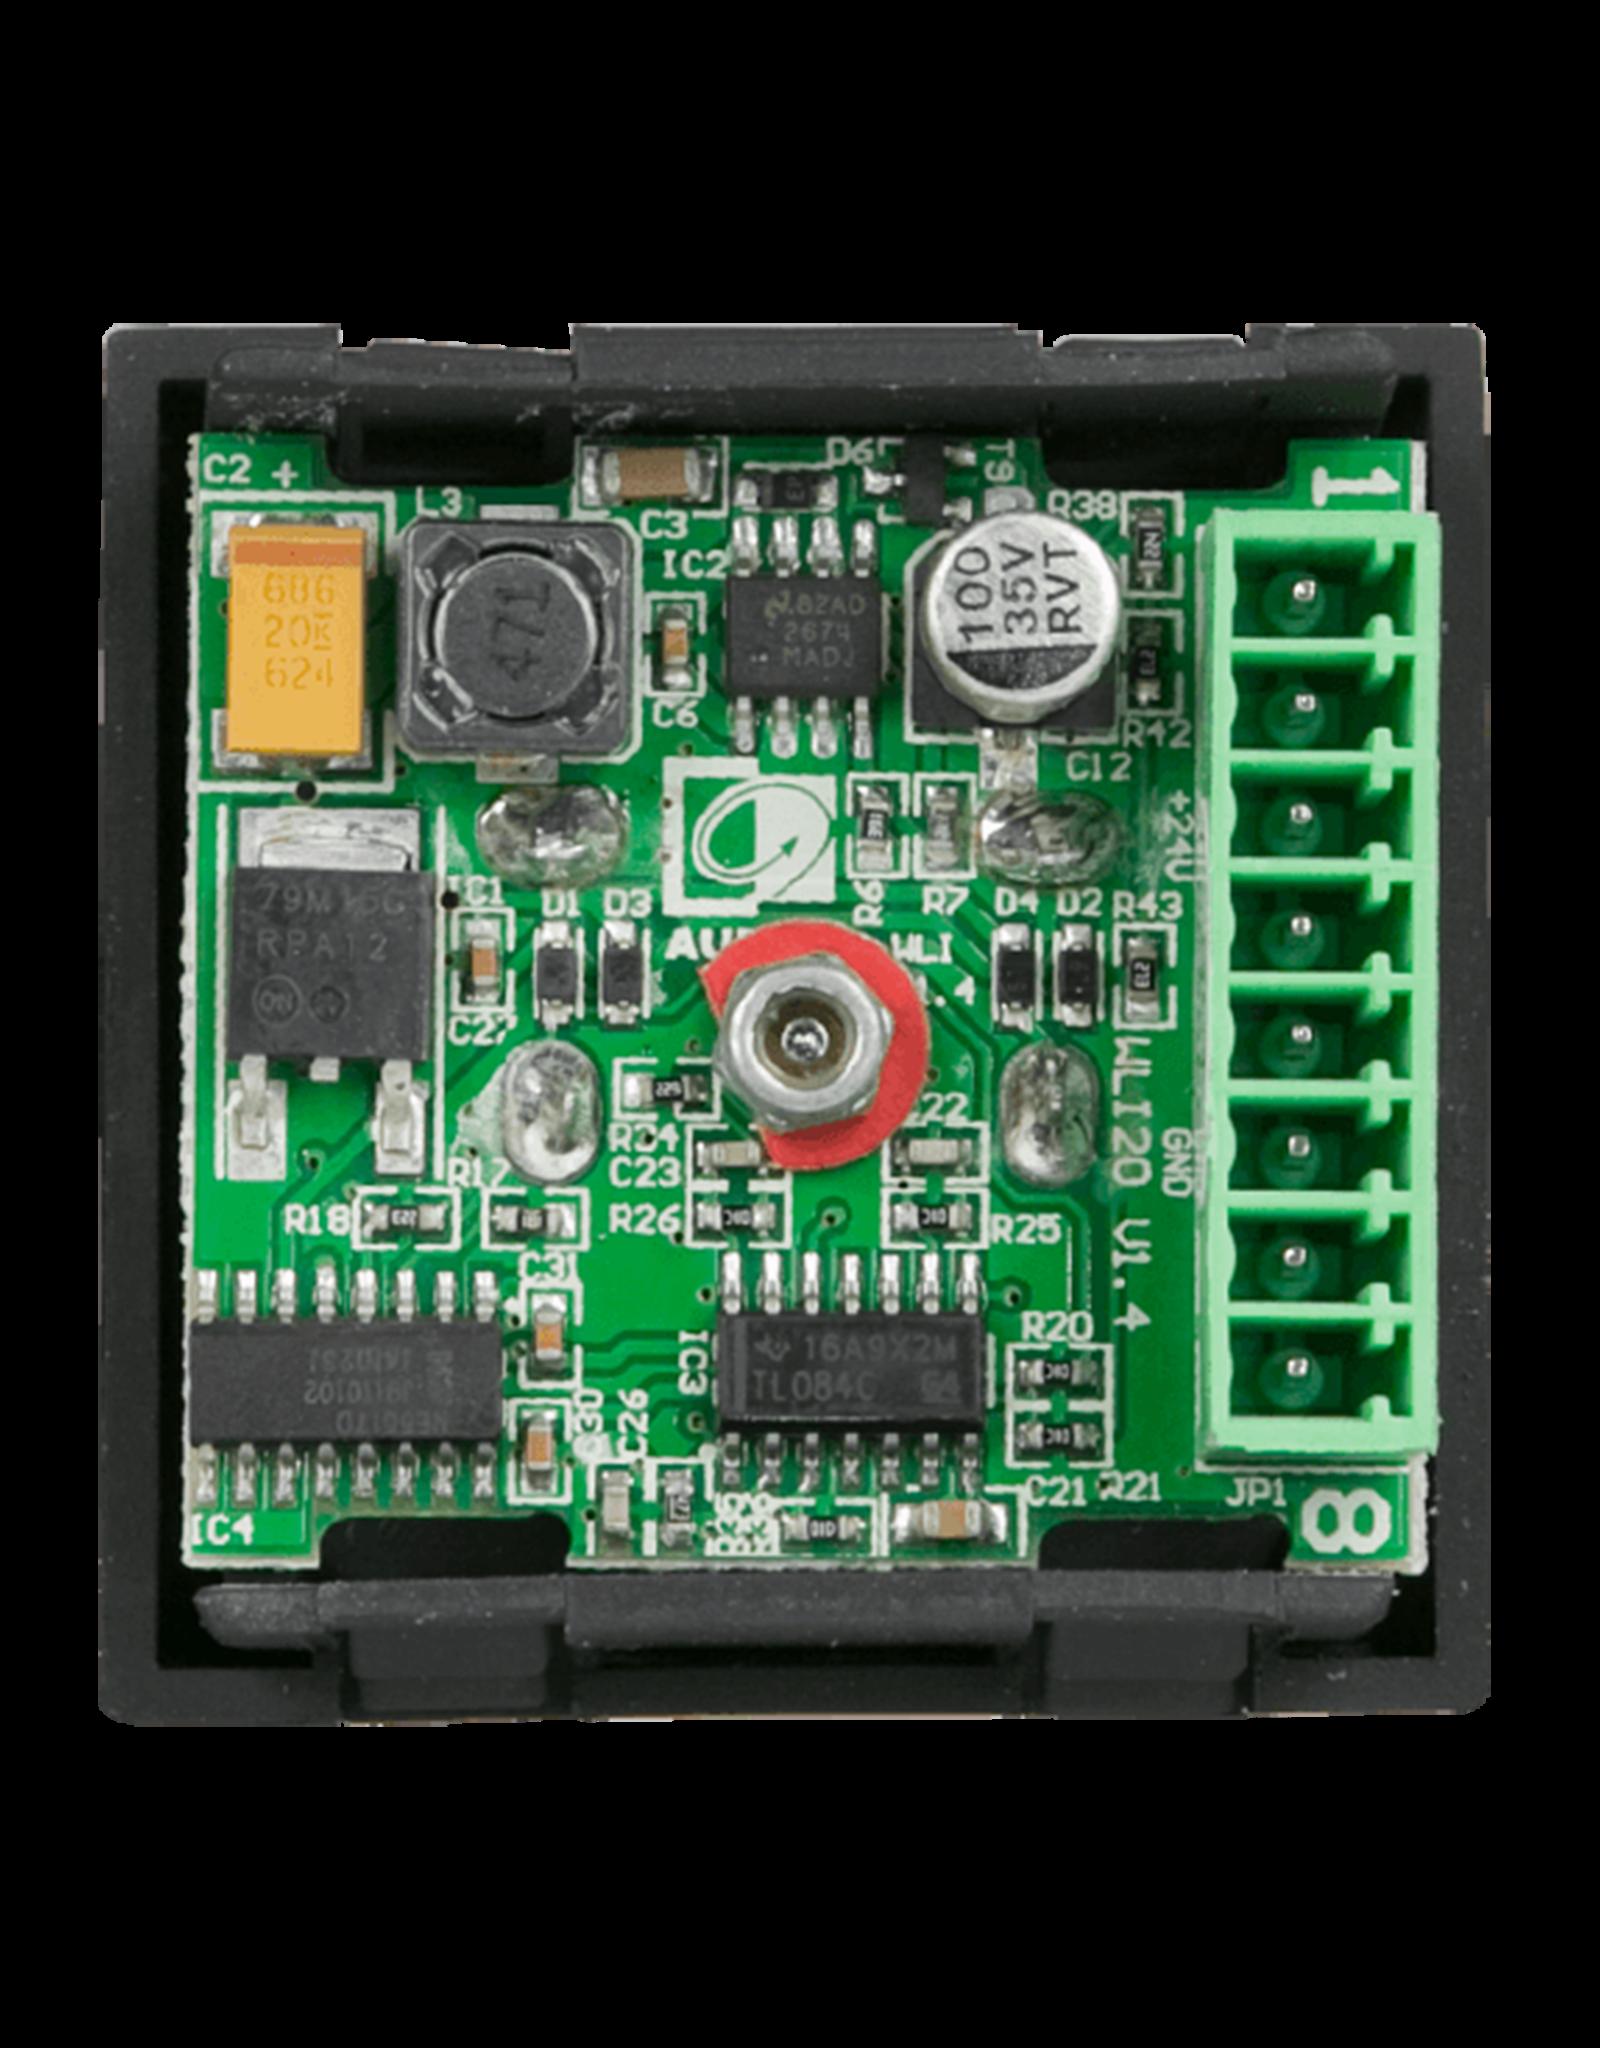 Audac Wall line input - 45x45mm - terminal block Wall line input - 45x45 mm- terminal block - black